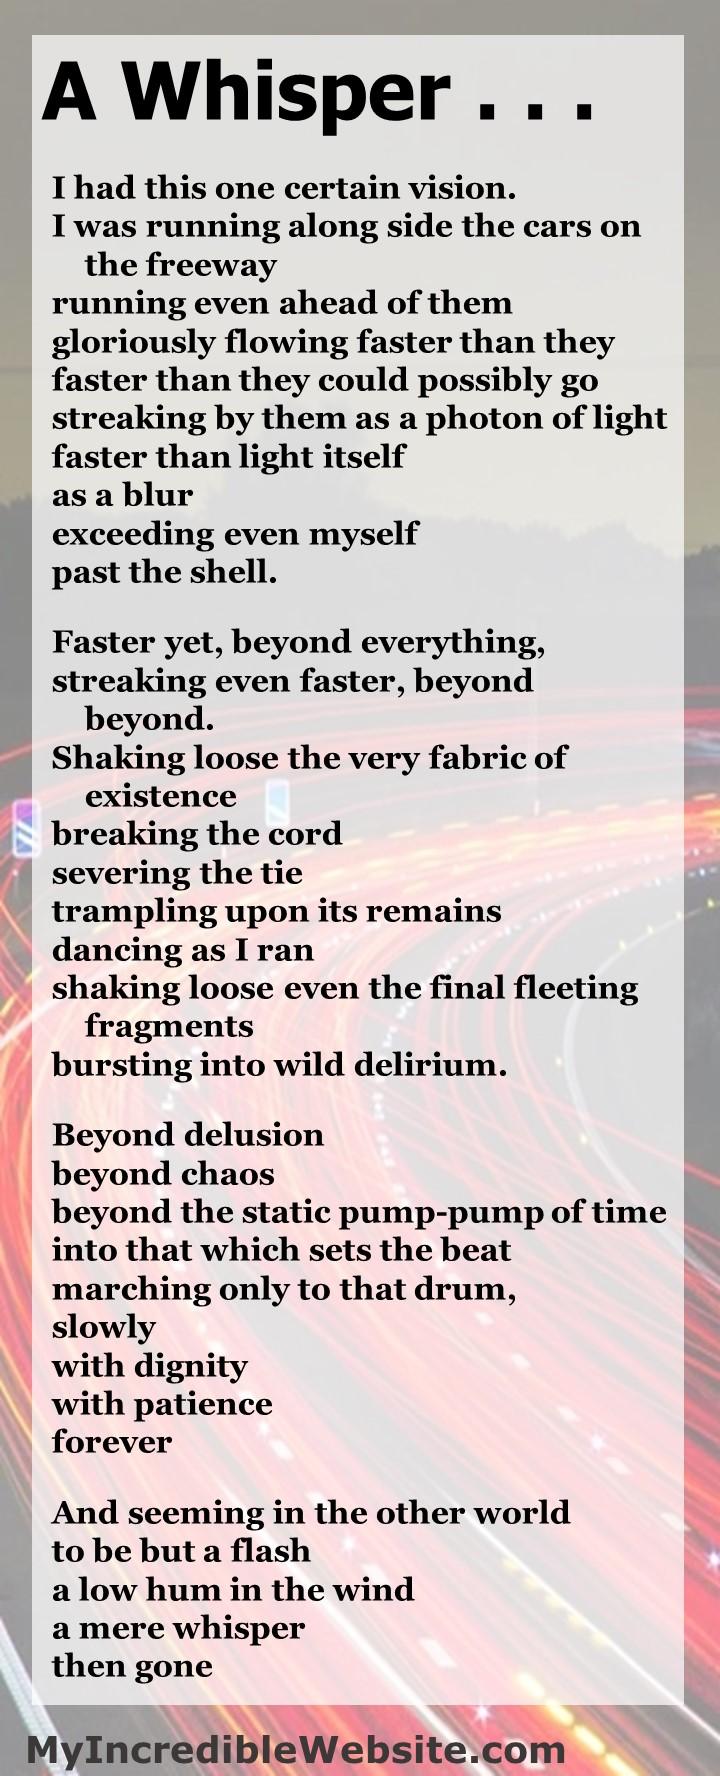 A Whisper a poem by John Kremer